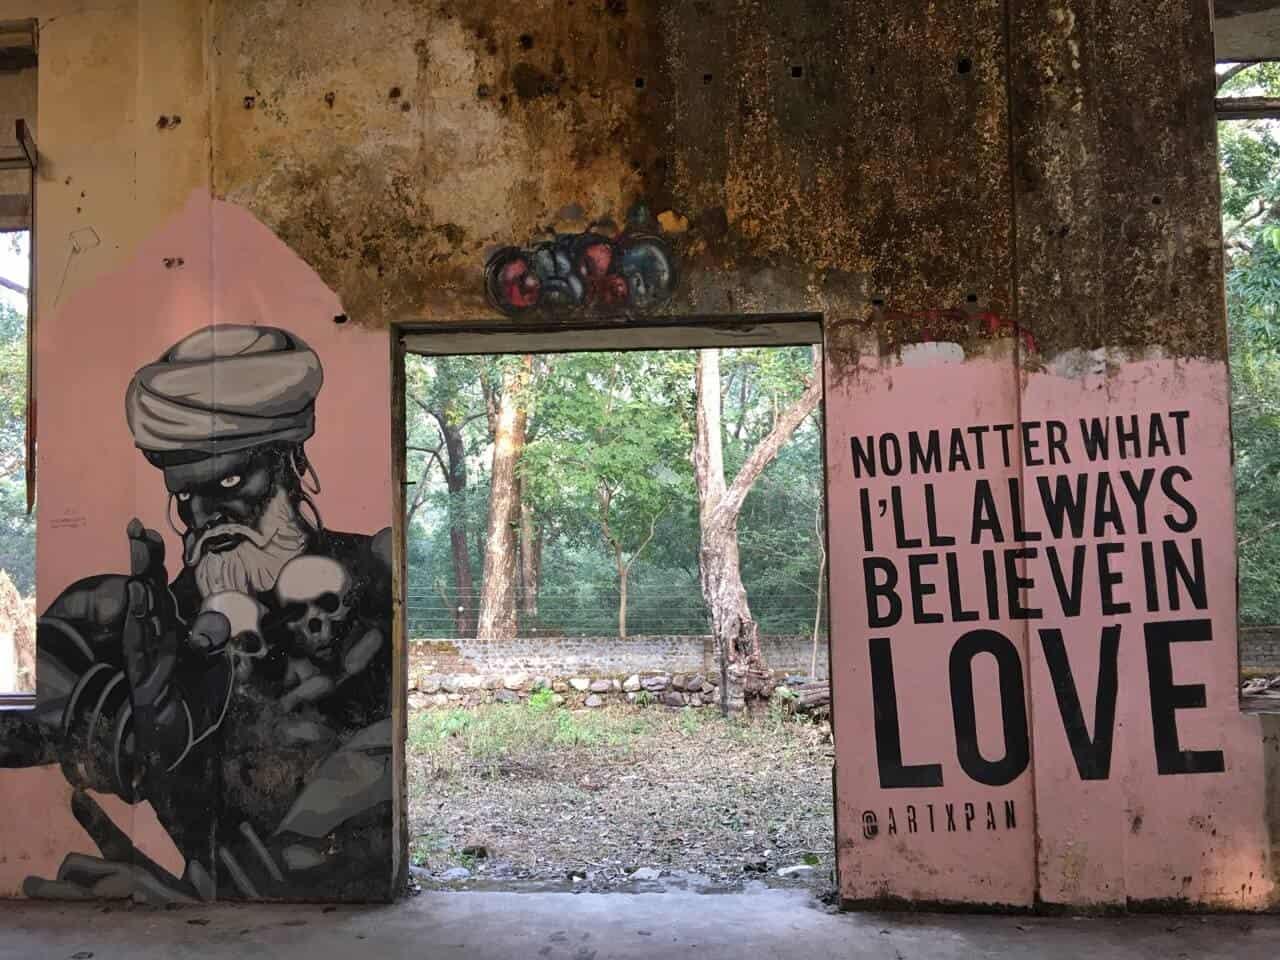 beatles ashram, Rishikesh murals